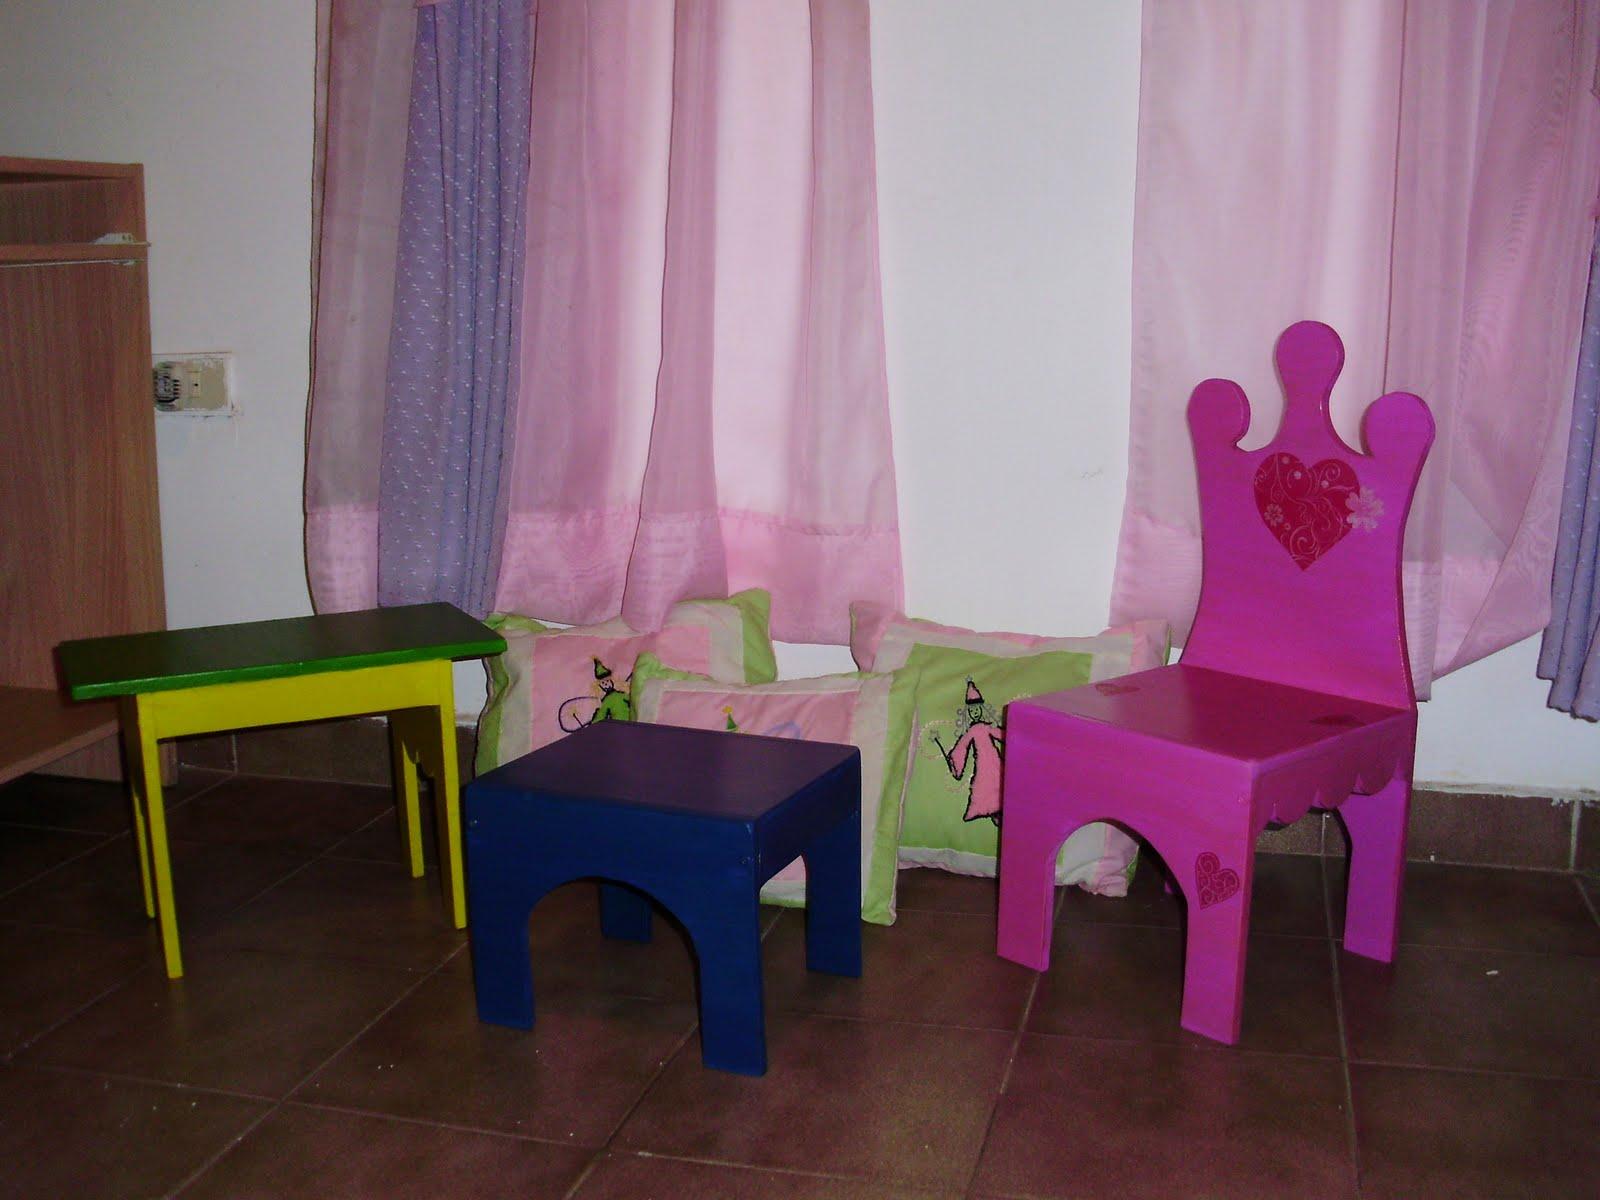 Maderar desing sillas para ni os for Sillas para 2 ninos diferente edad